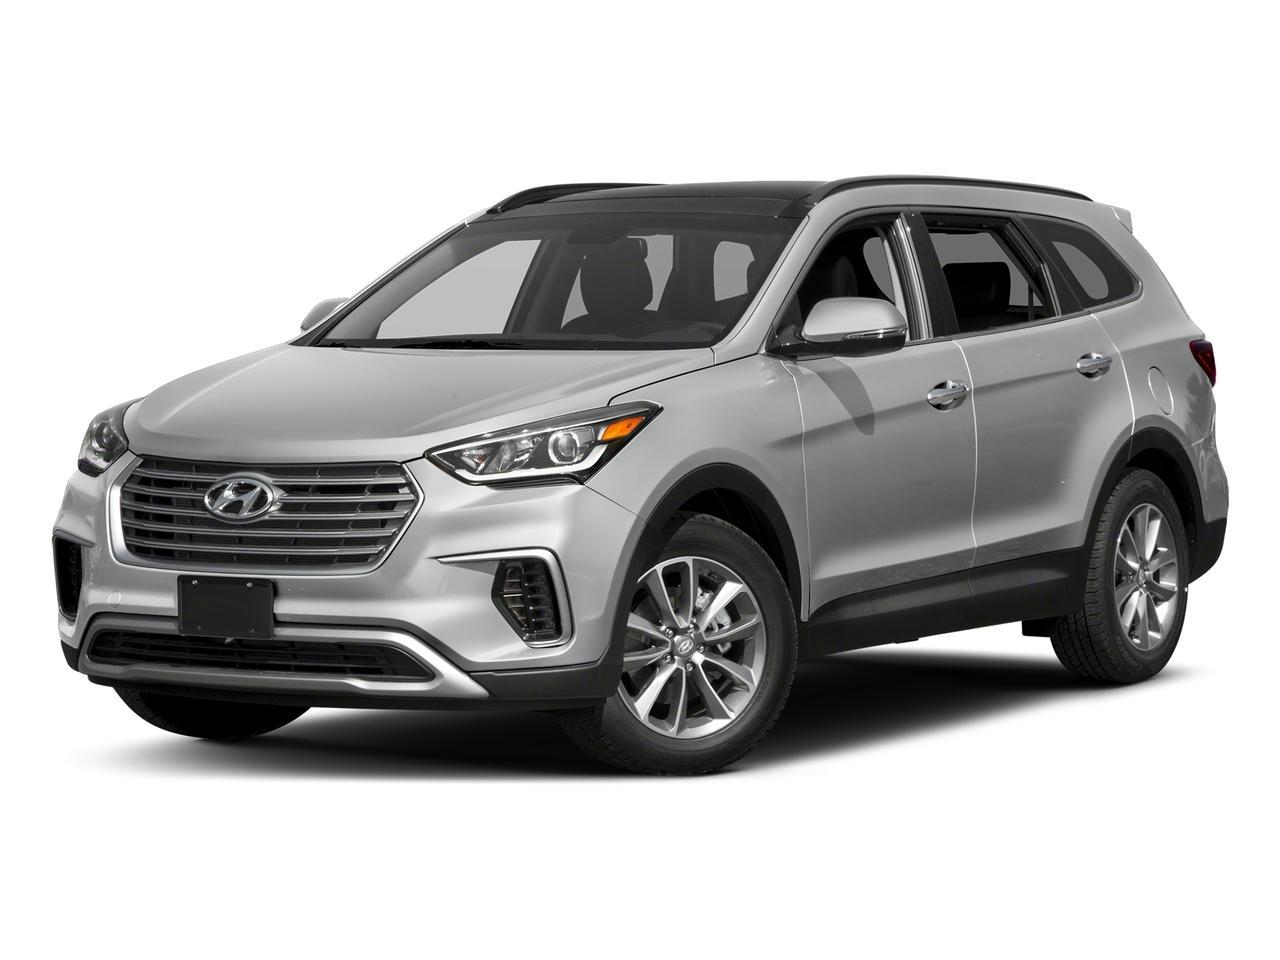 2018 Hyundai Santa Fe Vehicle Photo in Carlisle, PA 17015